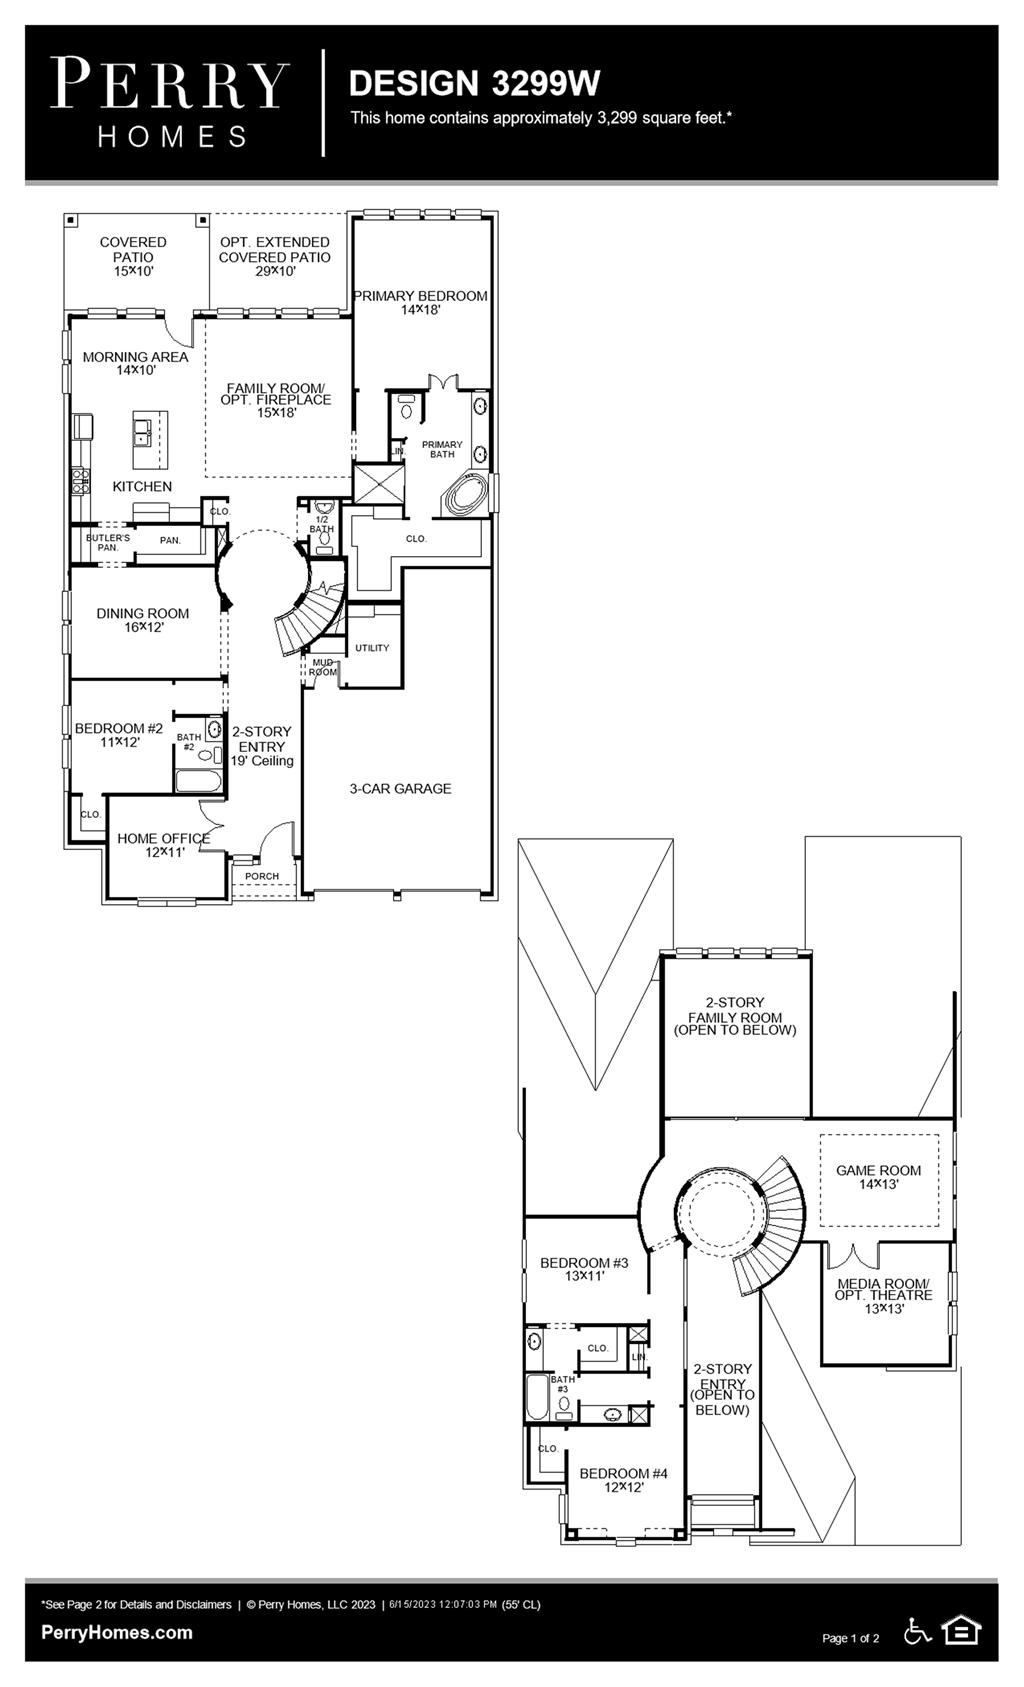 Floor Plan for 3299W